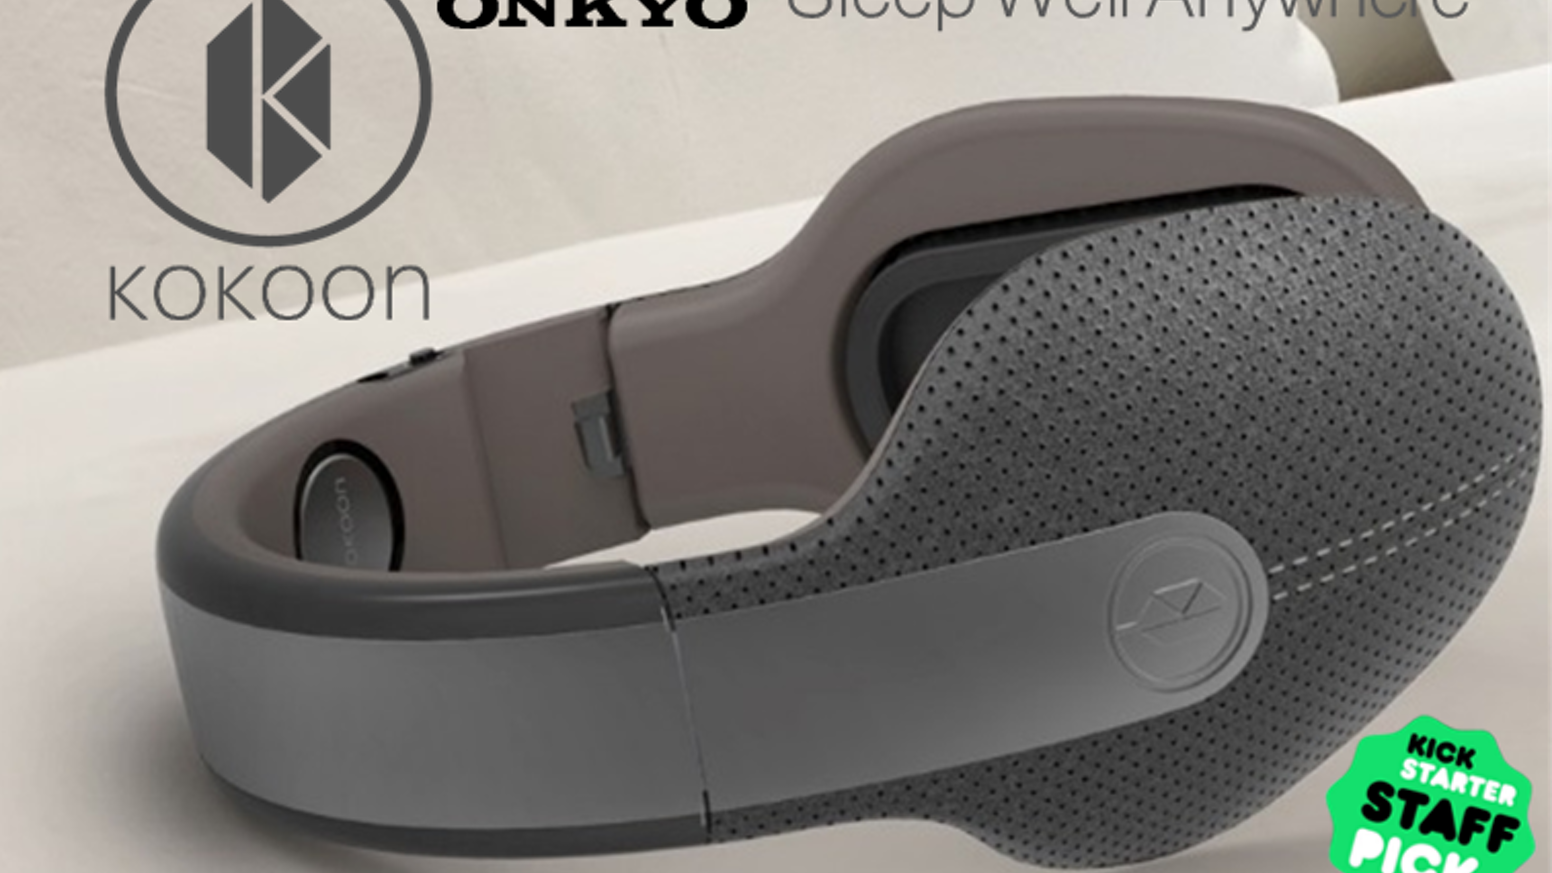 new appearance latest hot products The ultimate sleep sanctuary: Kokoon EEG headphones by Tim ...